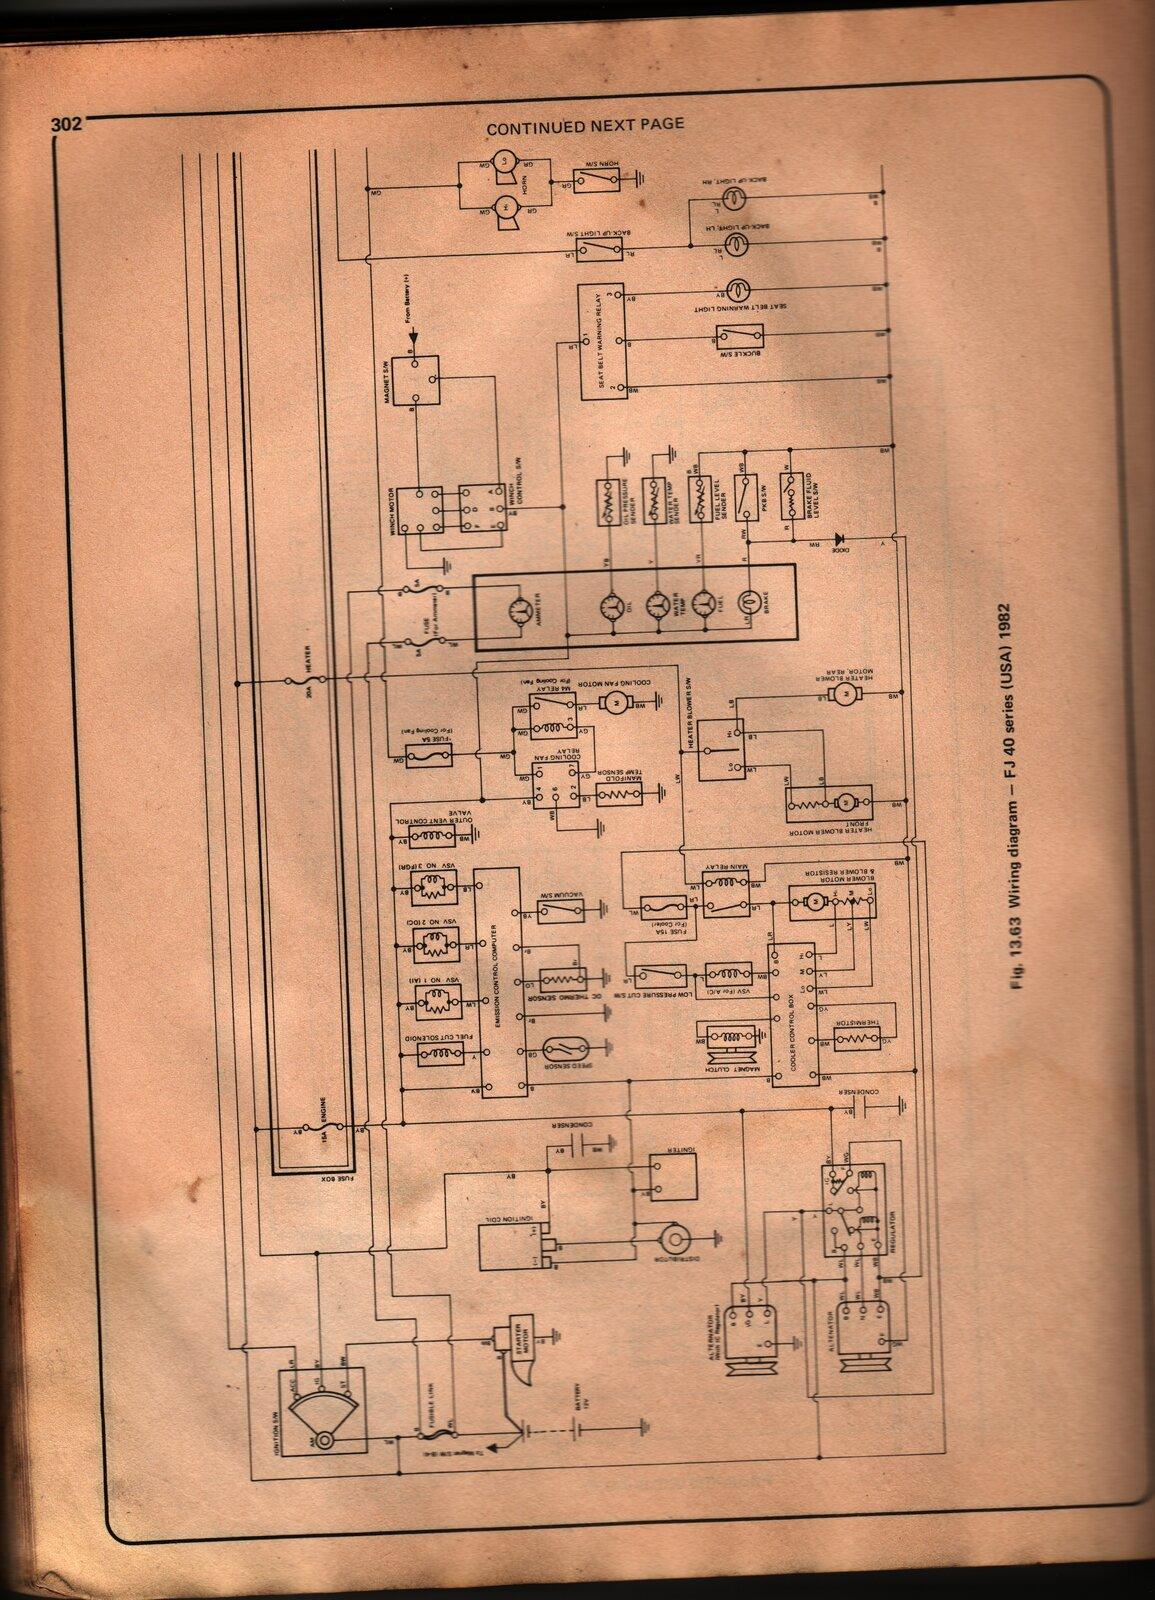 fj45 82 wiring dia.jpg